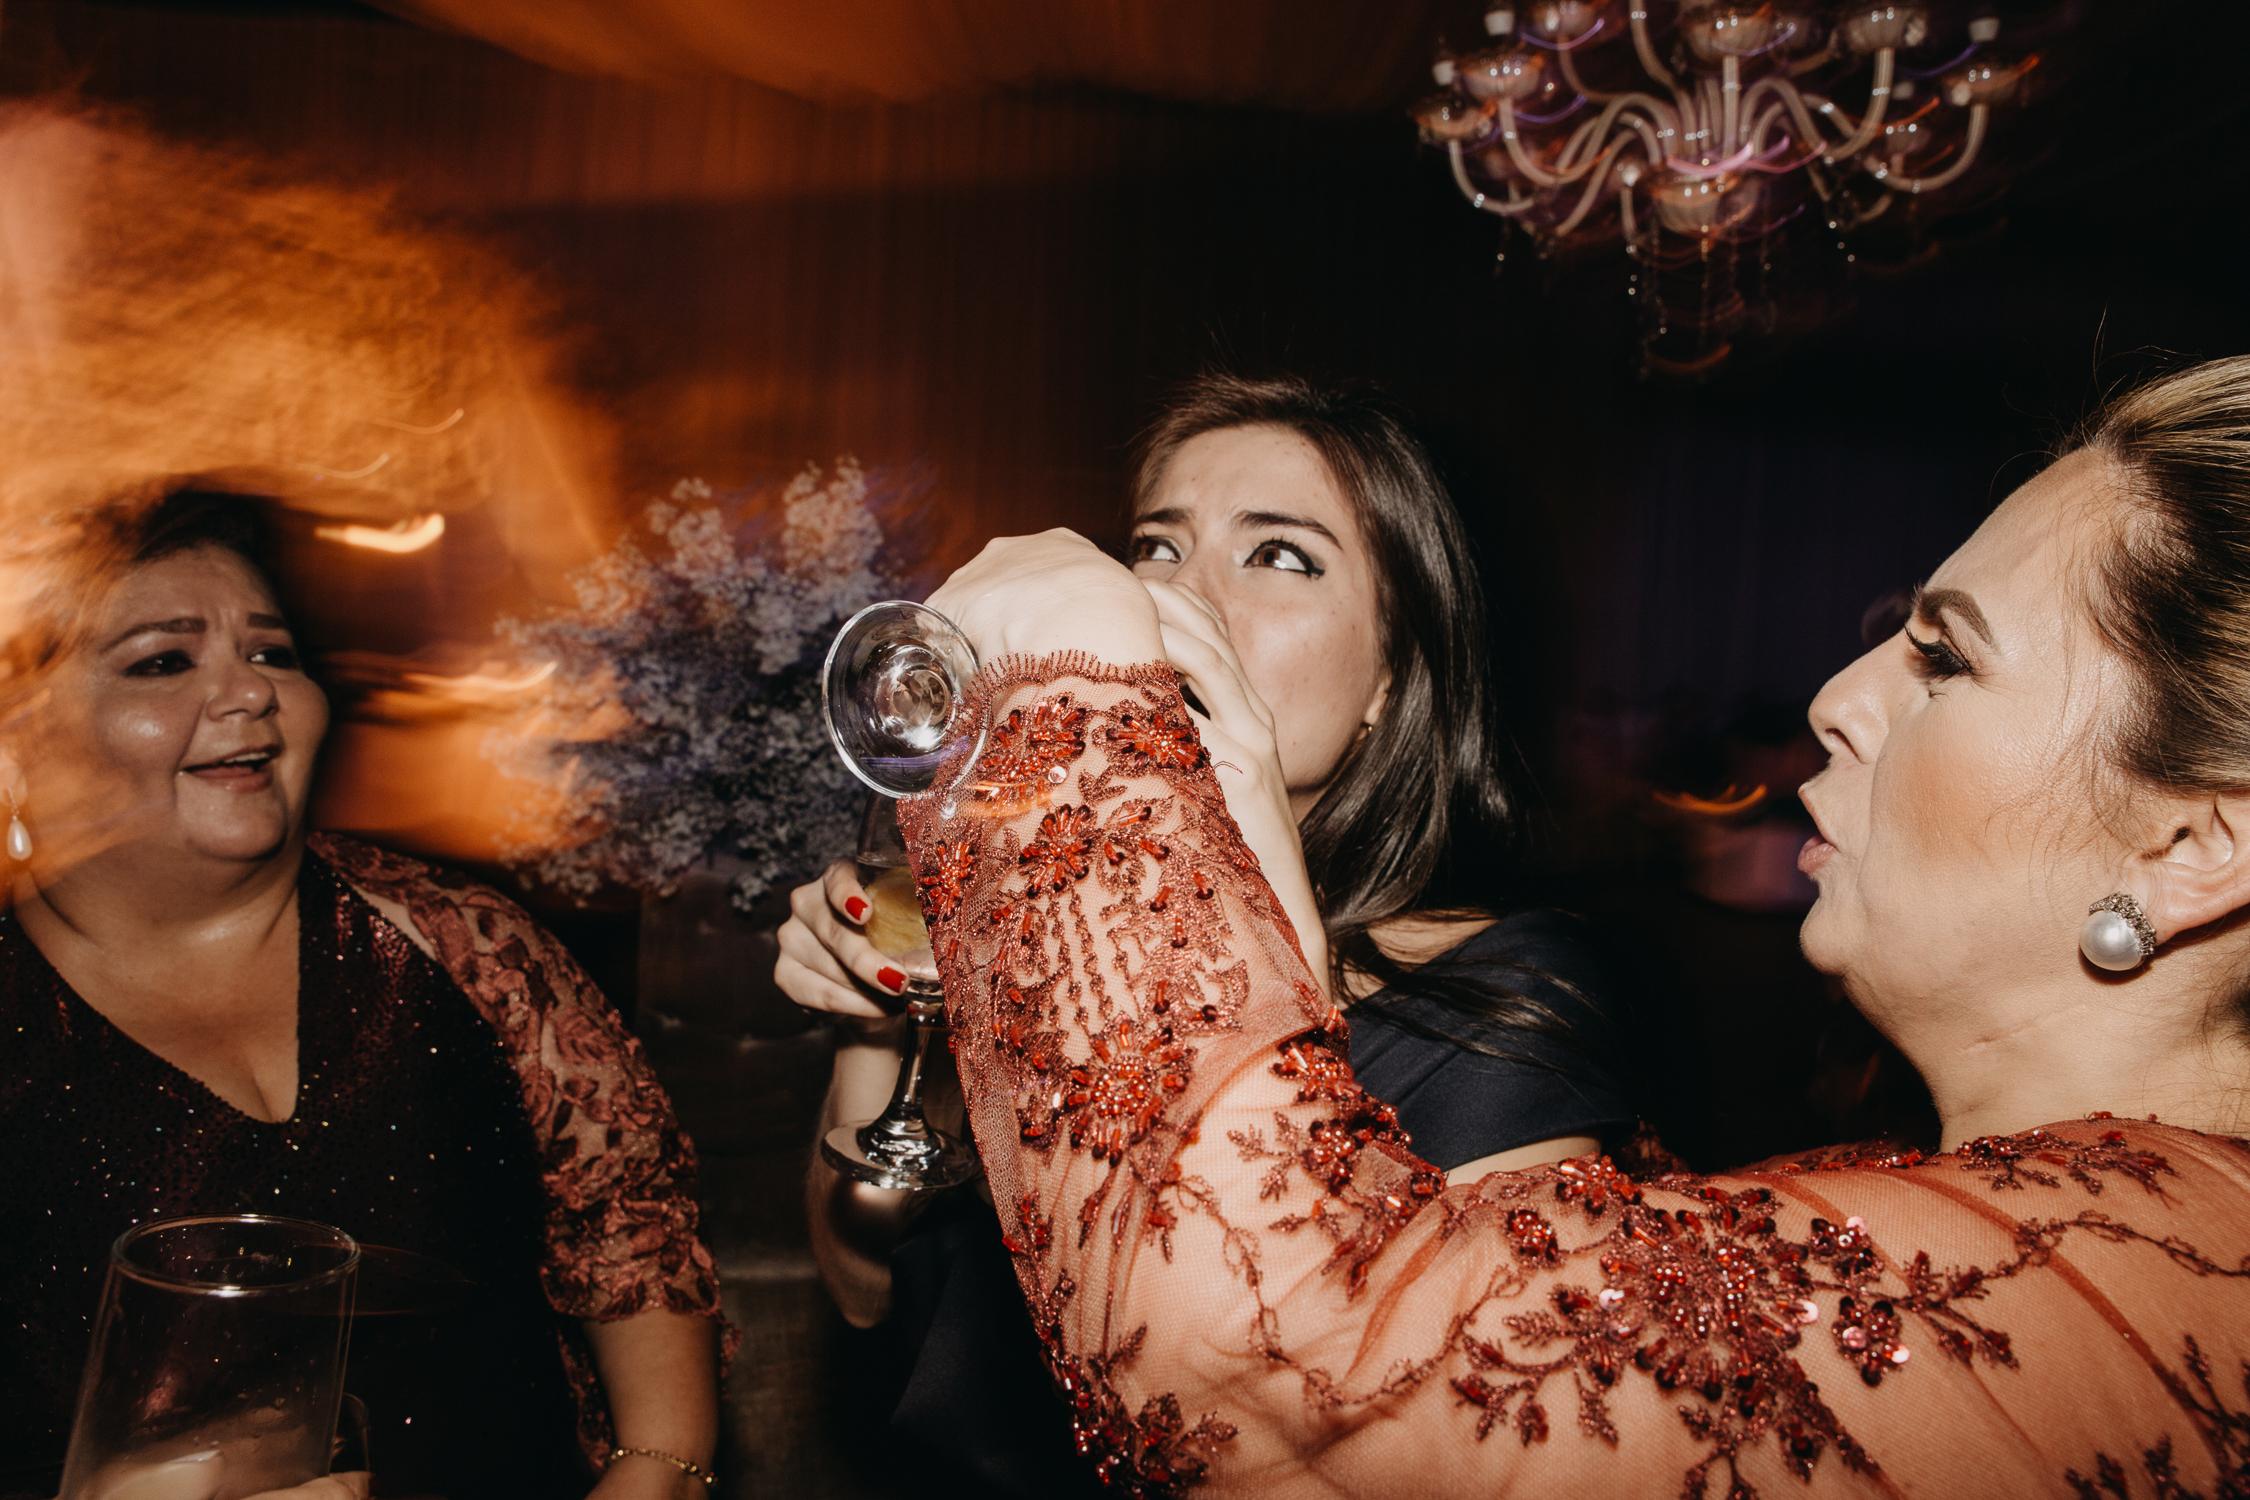 Michelle-Agurto-Fotografia-Bodas-Ecuador-Destination-Wedding-Photographer-Vicky-Javier-236.JPG